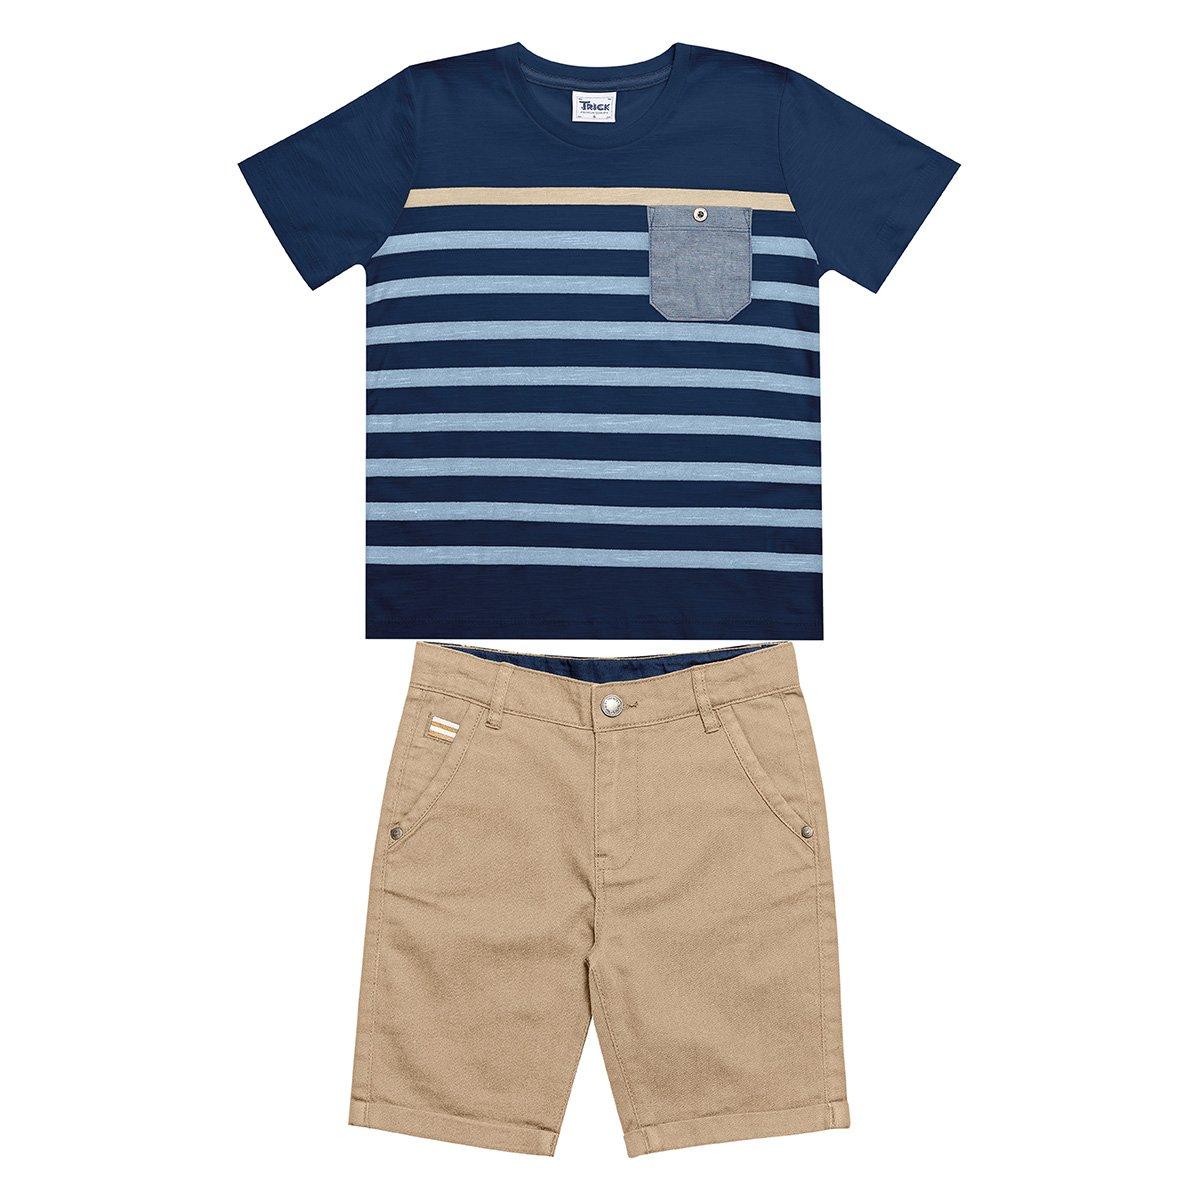 Conjunto Bebê Trick Nick Camiseta Flamê + Bermuda Masculino